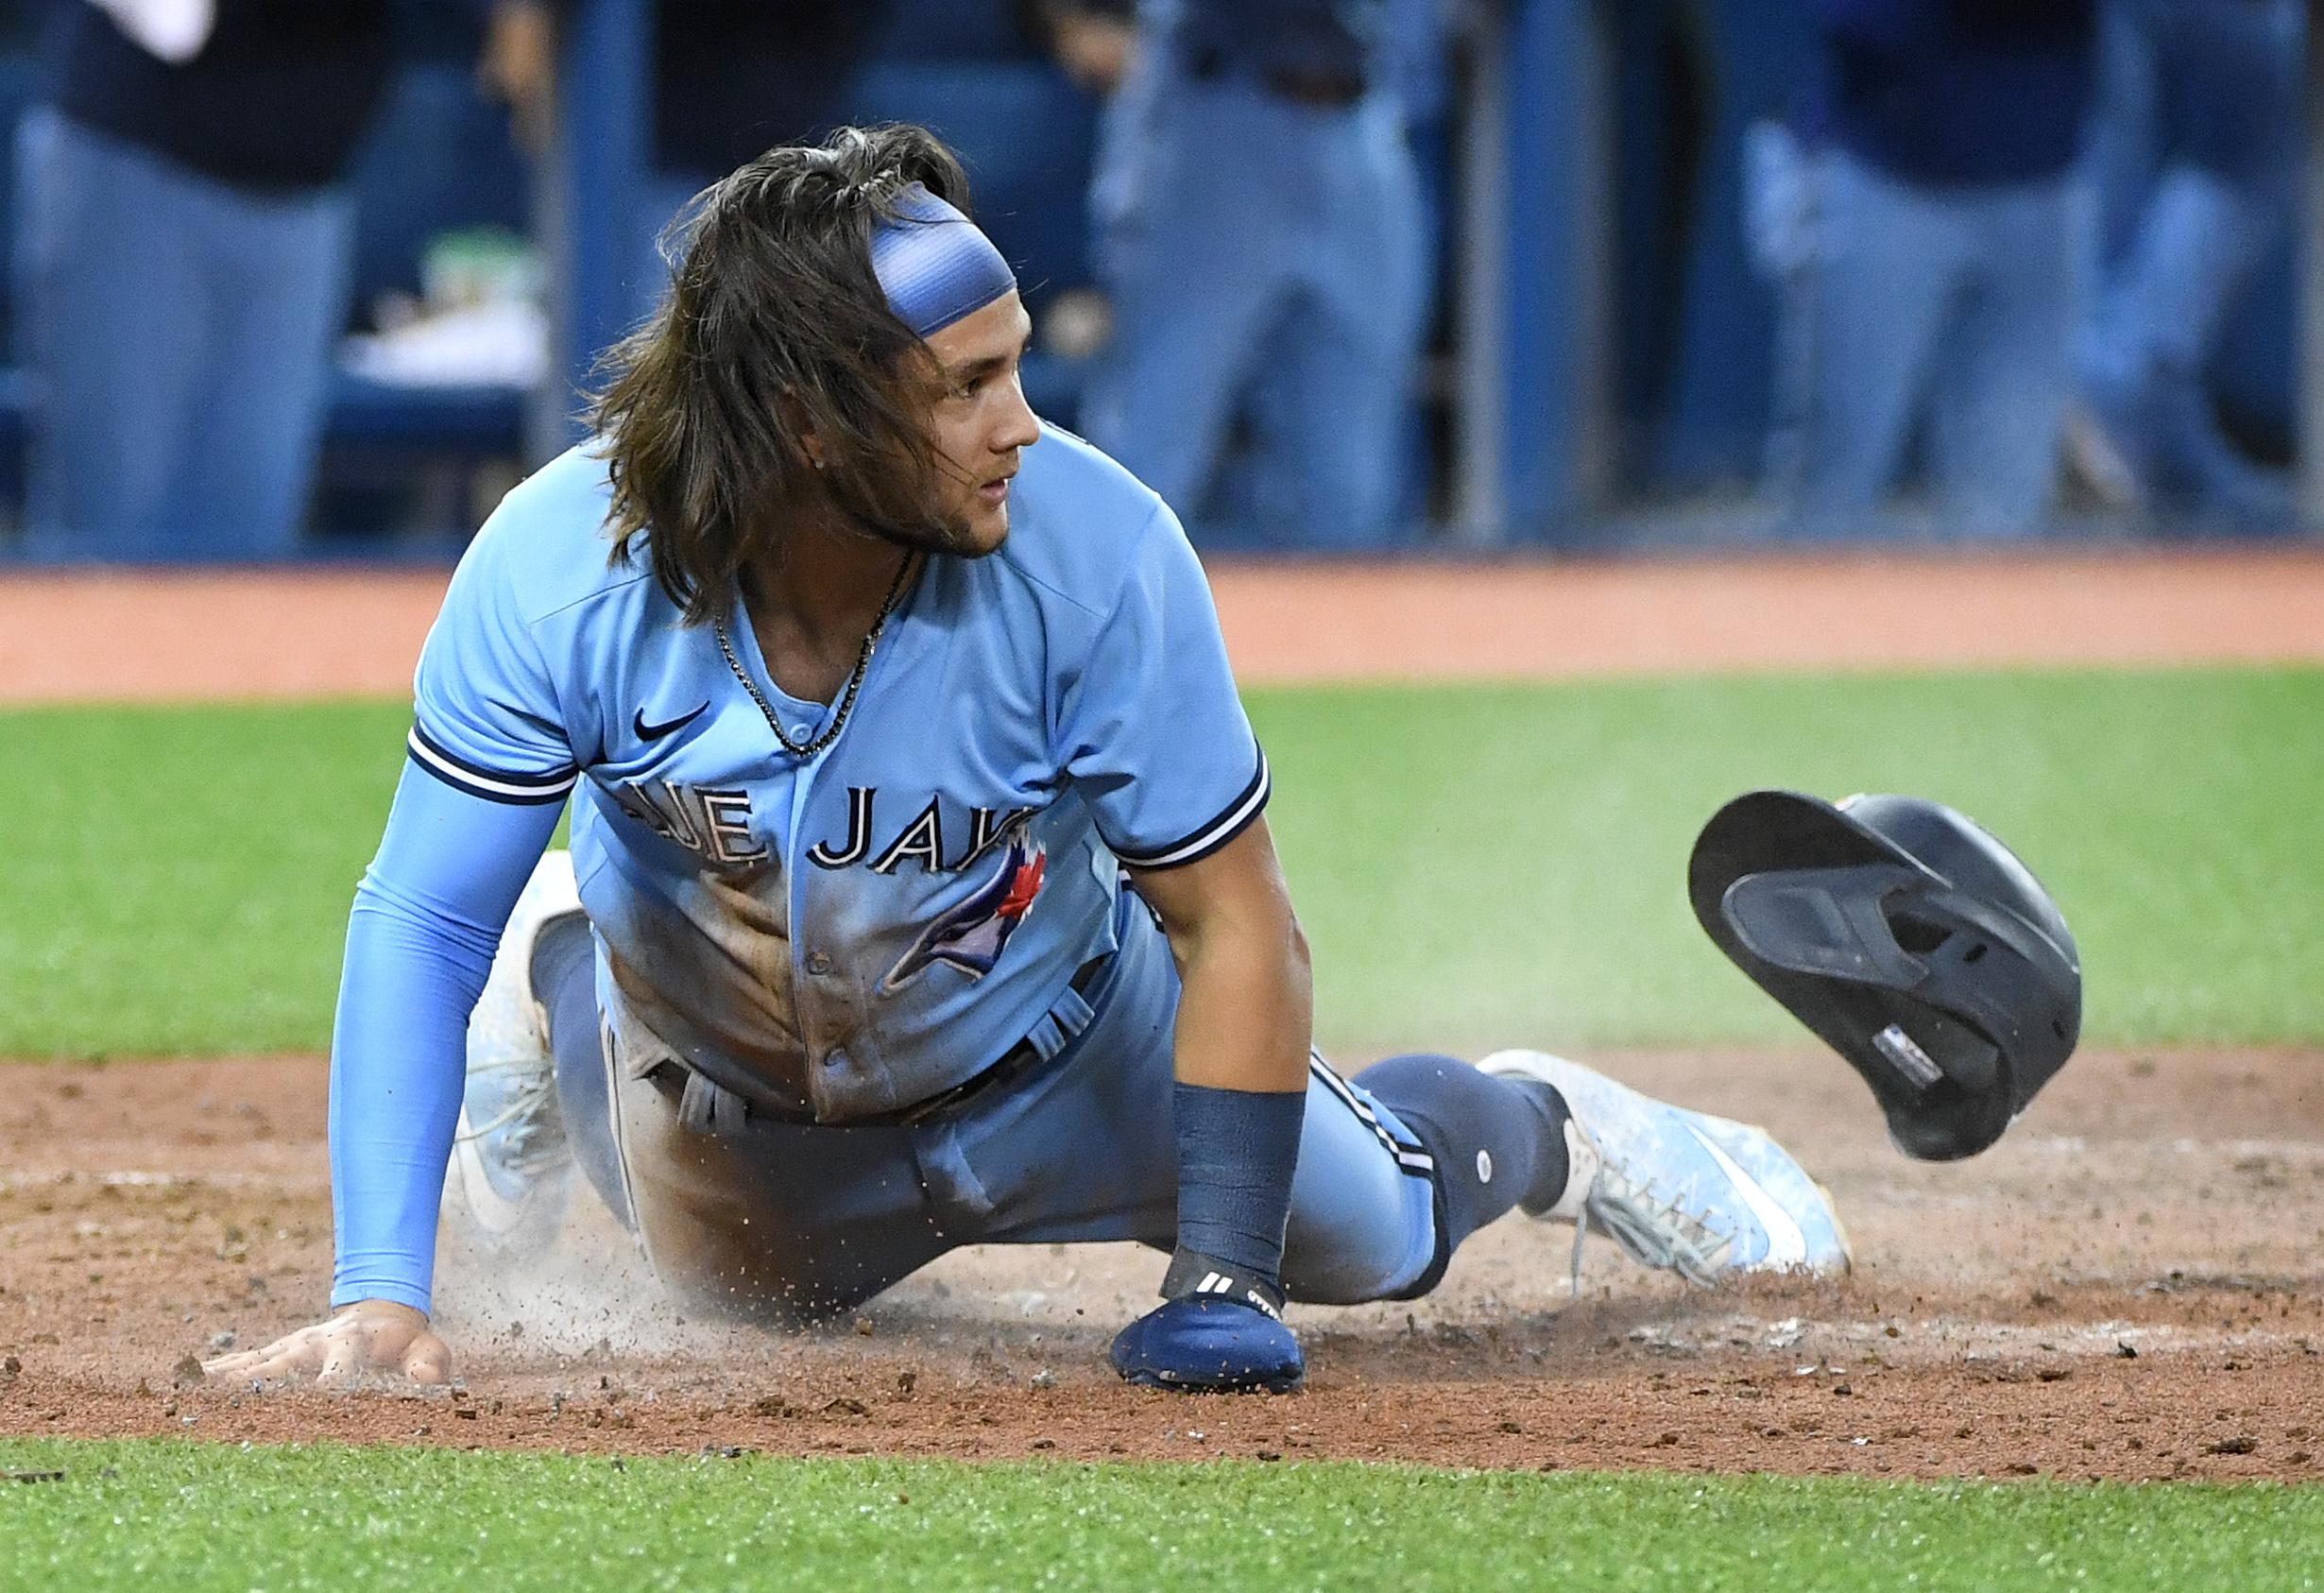 MLB: Chicago White Sox at Toronto Blue Jays